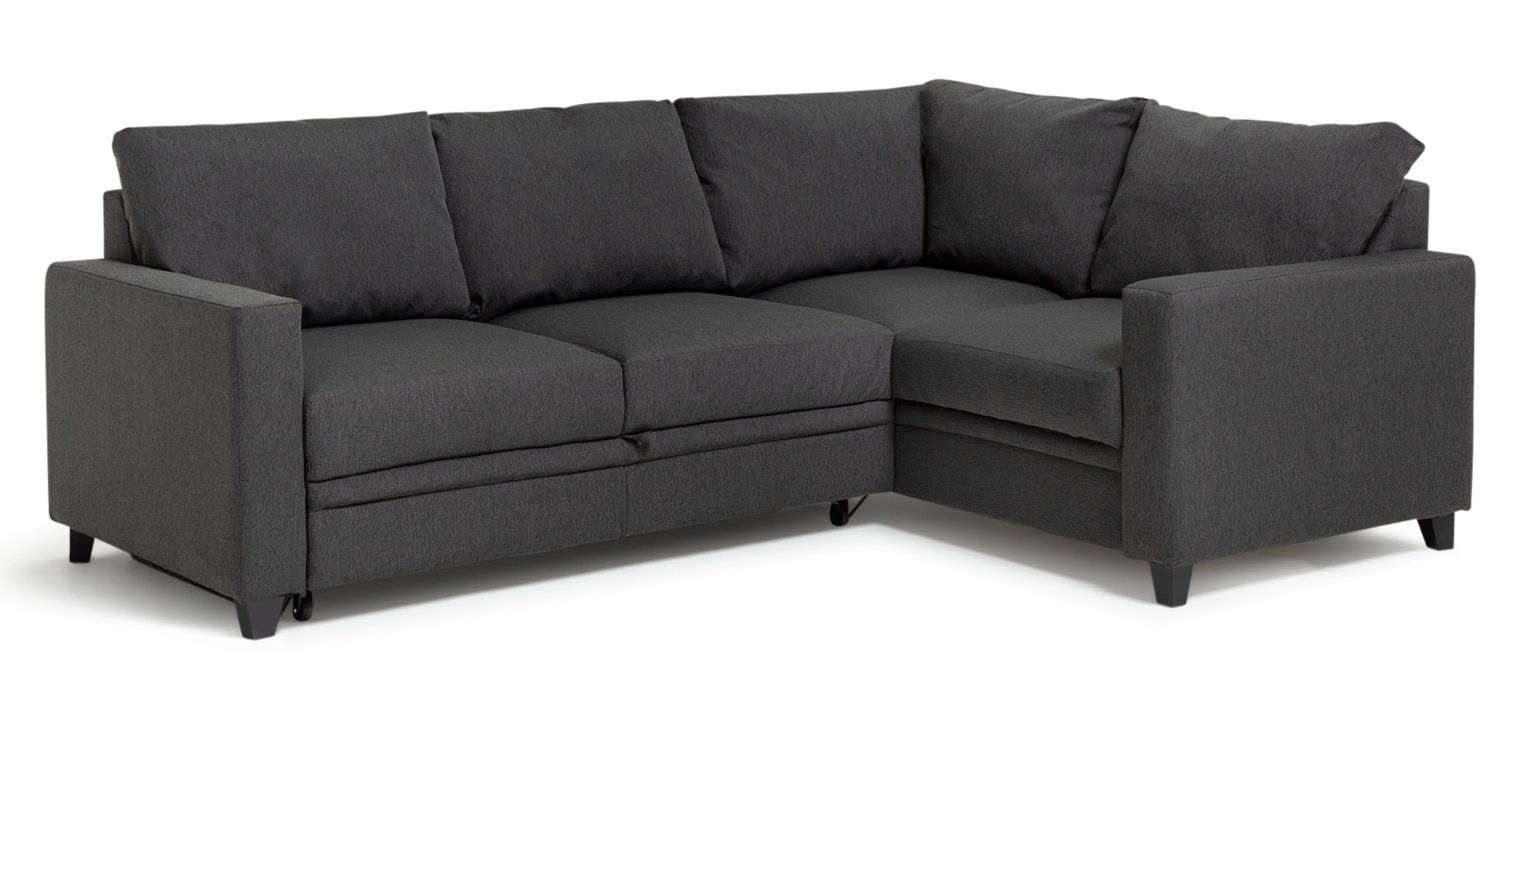 Sale On Hygena Seattle Fabric Right Hand Corner Sofa Bed